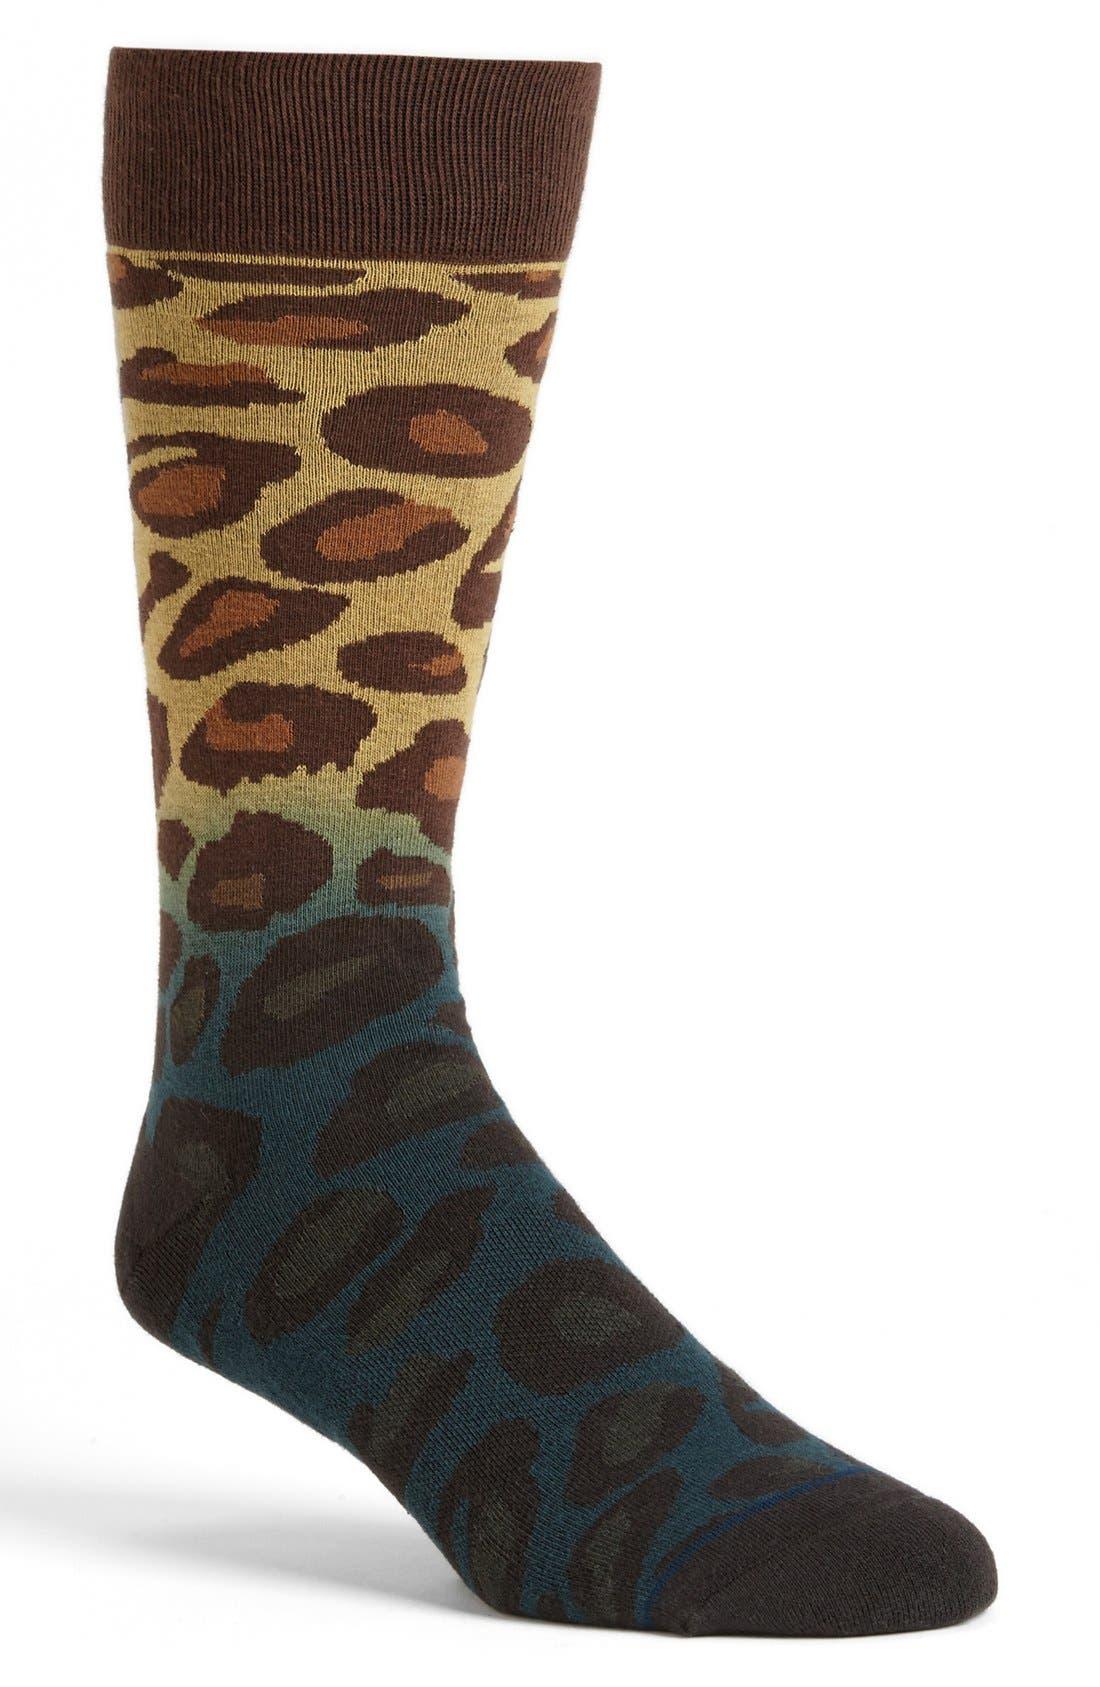 Alternate Image 1 Selected - Stance 'Sahara' Socks